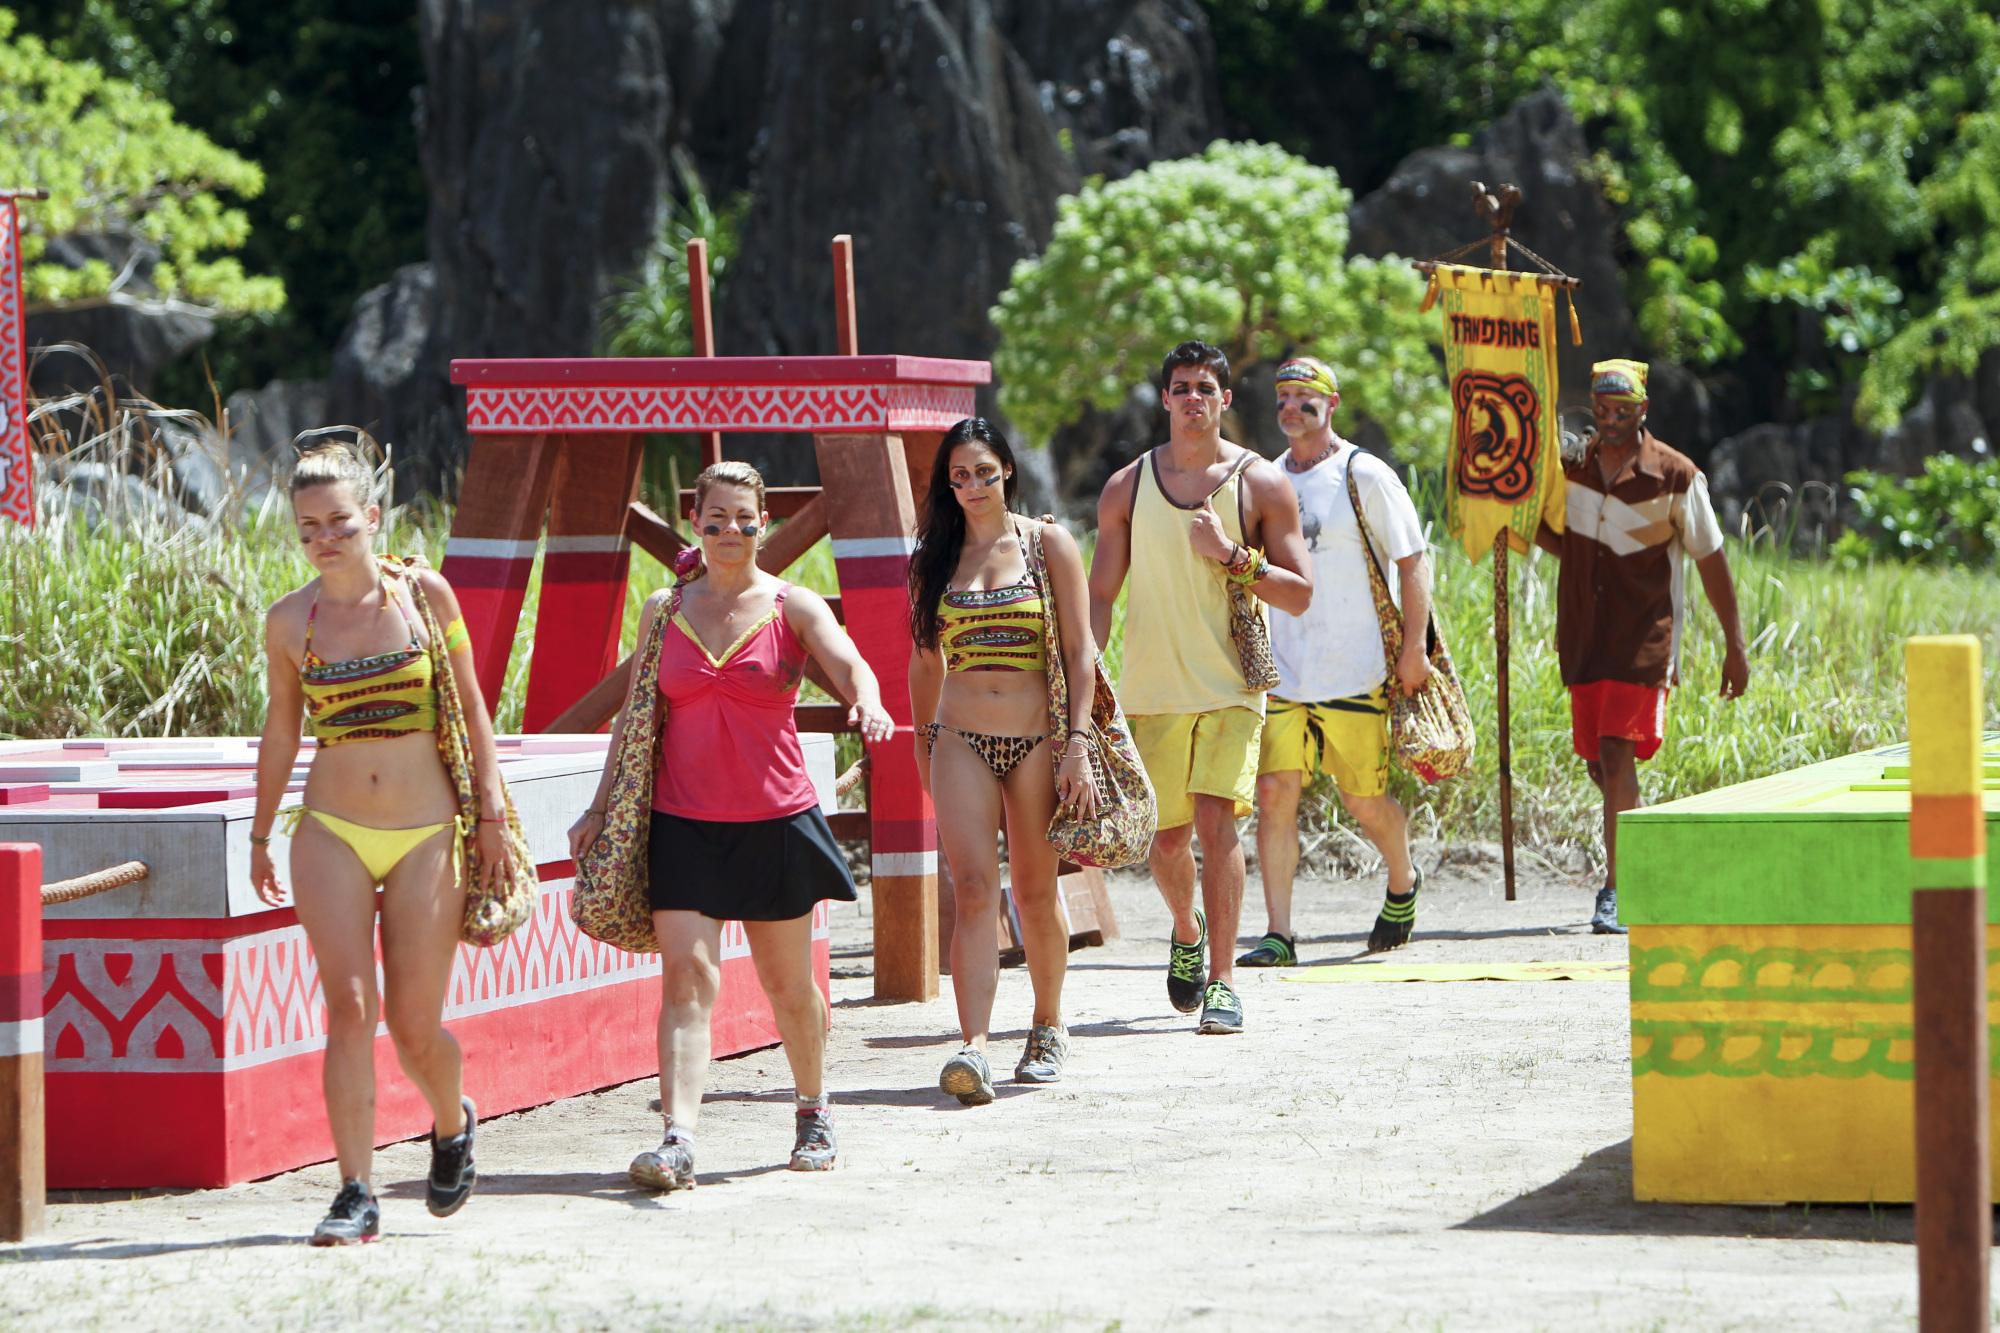 The Tandang Tribe